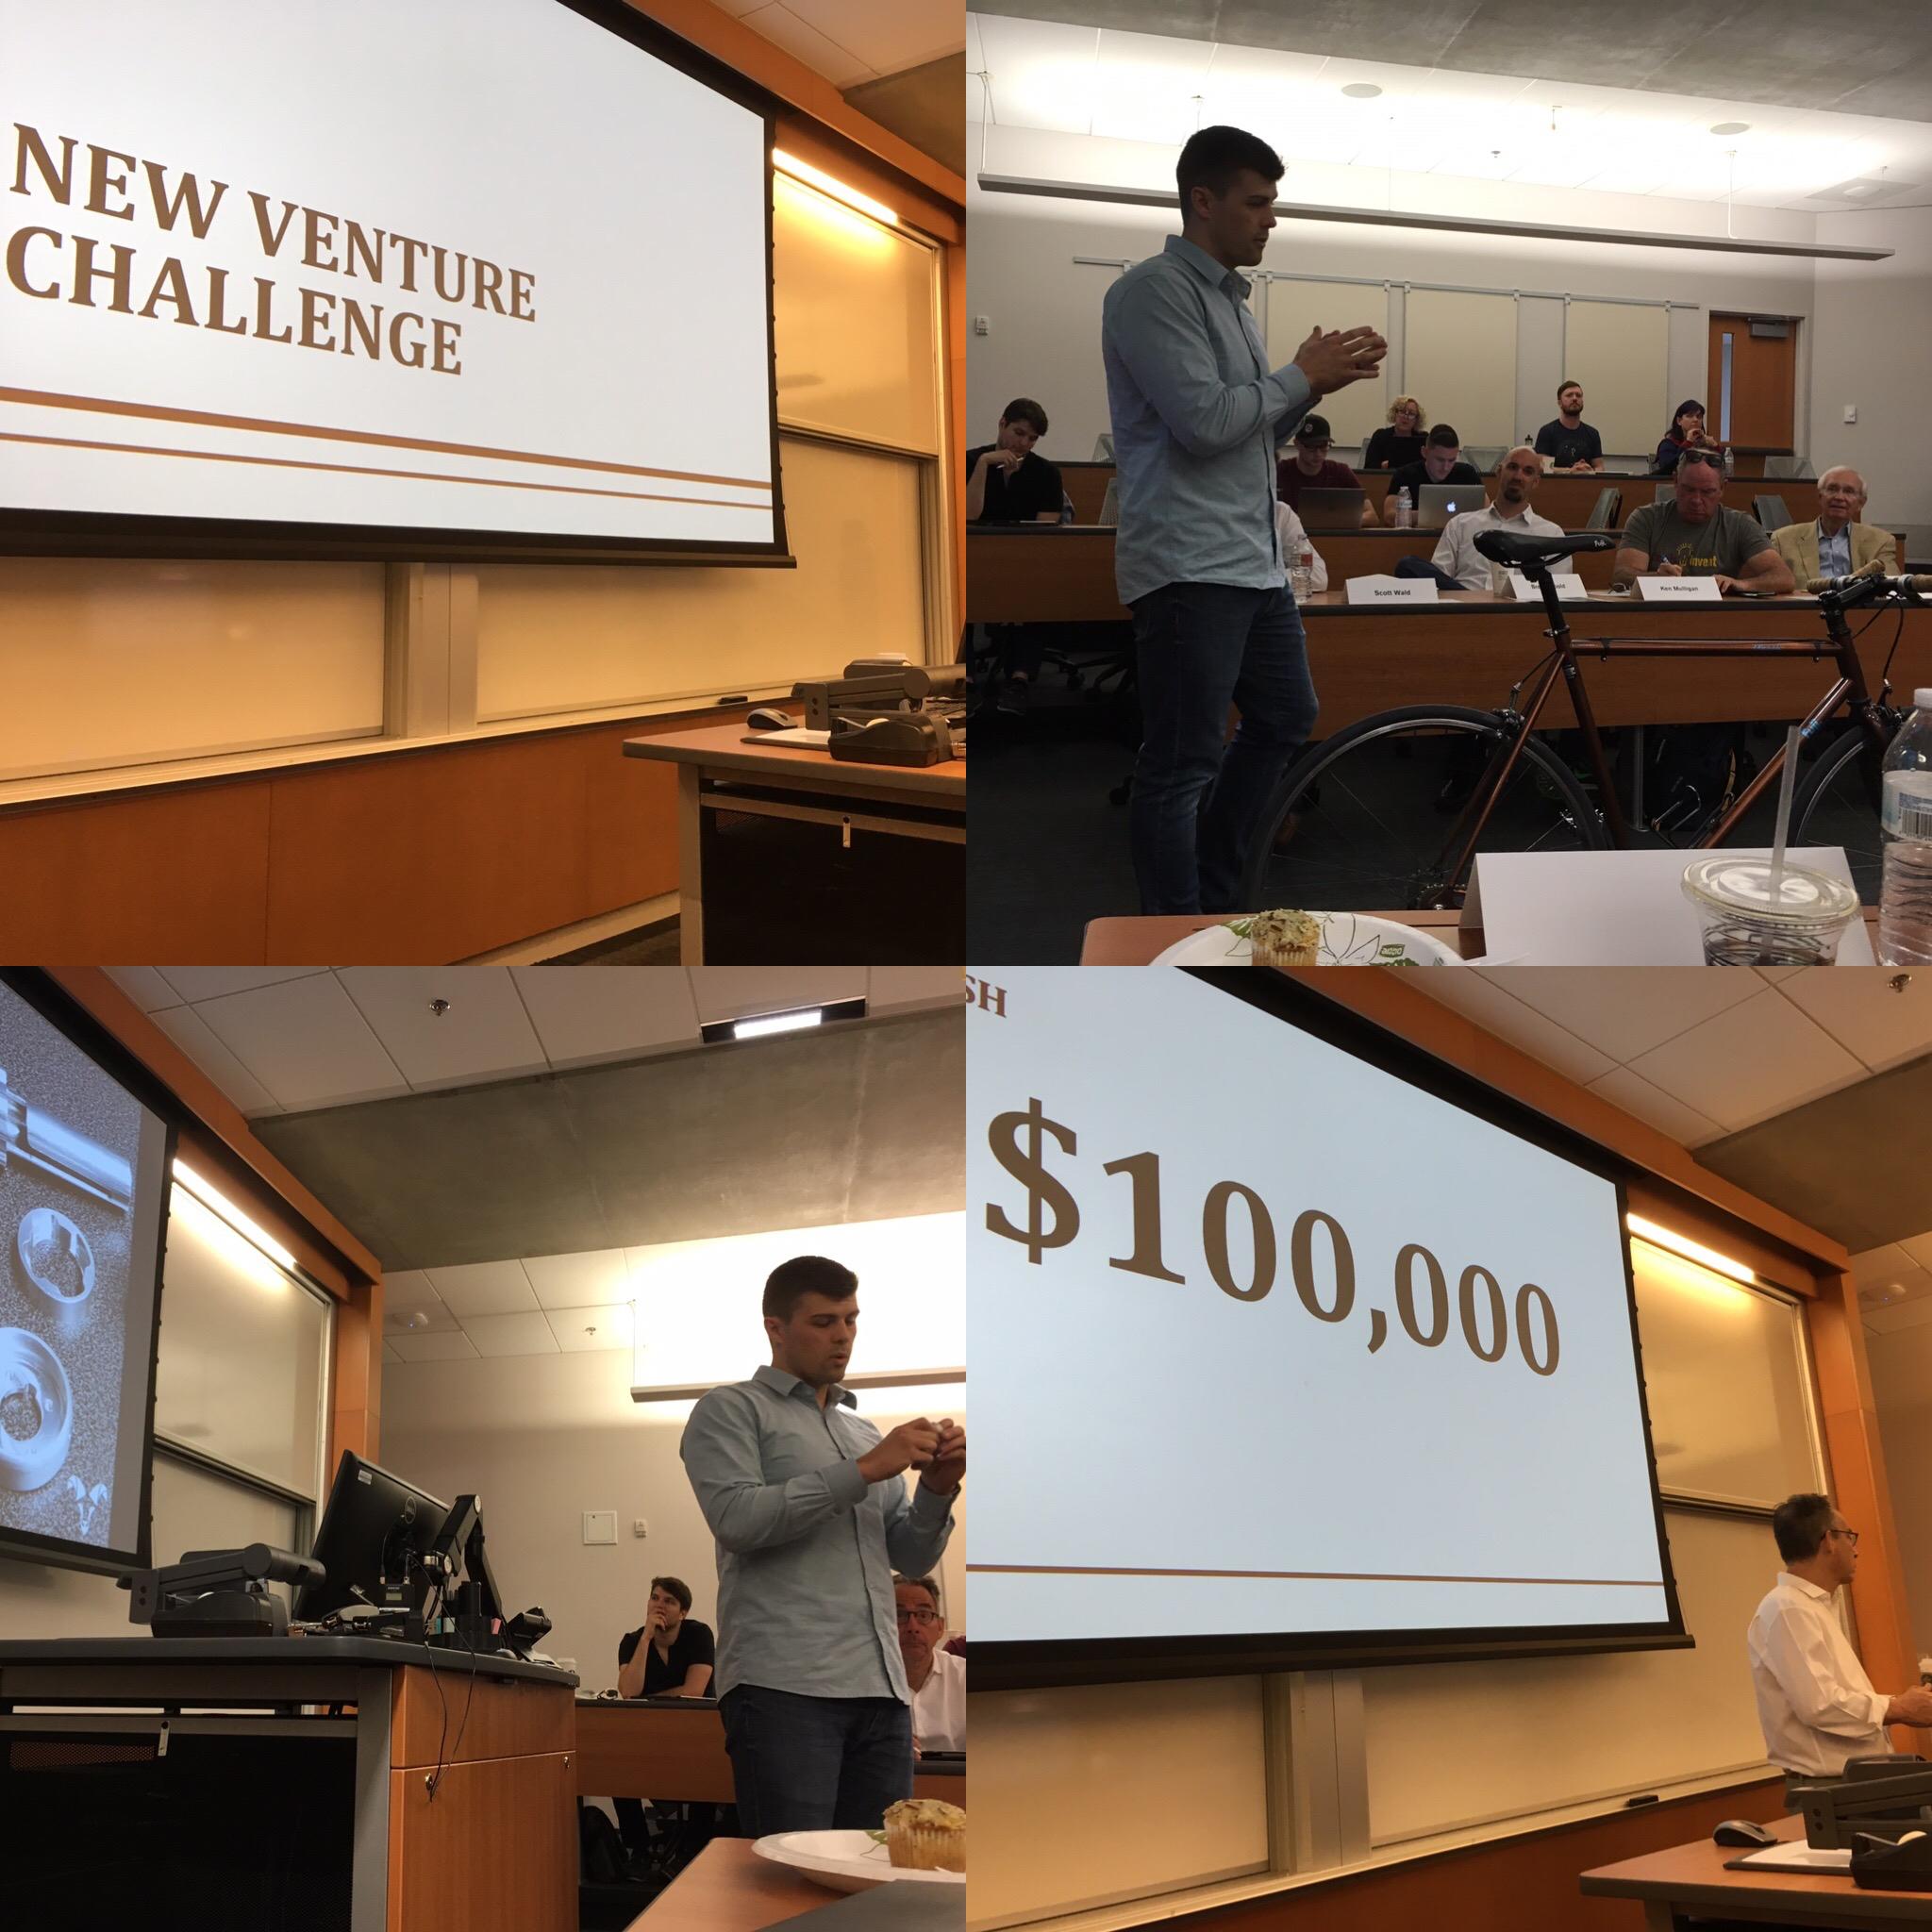 Judged the New Venture Challenge  ASU WP Carey School of Business